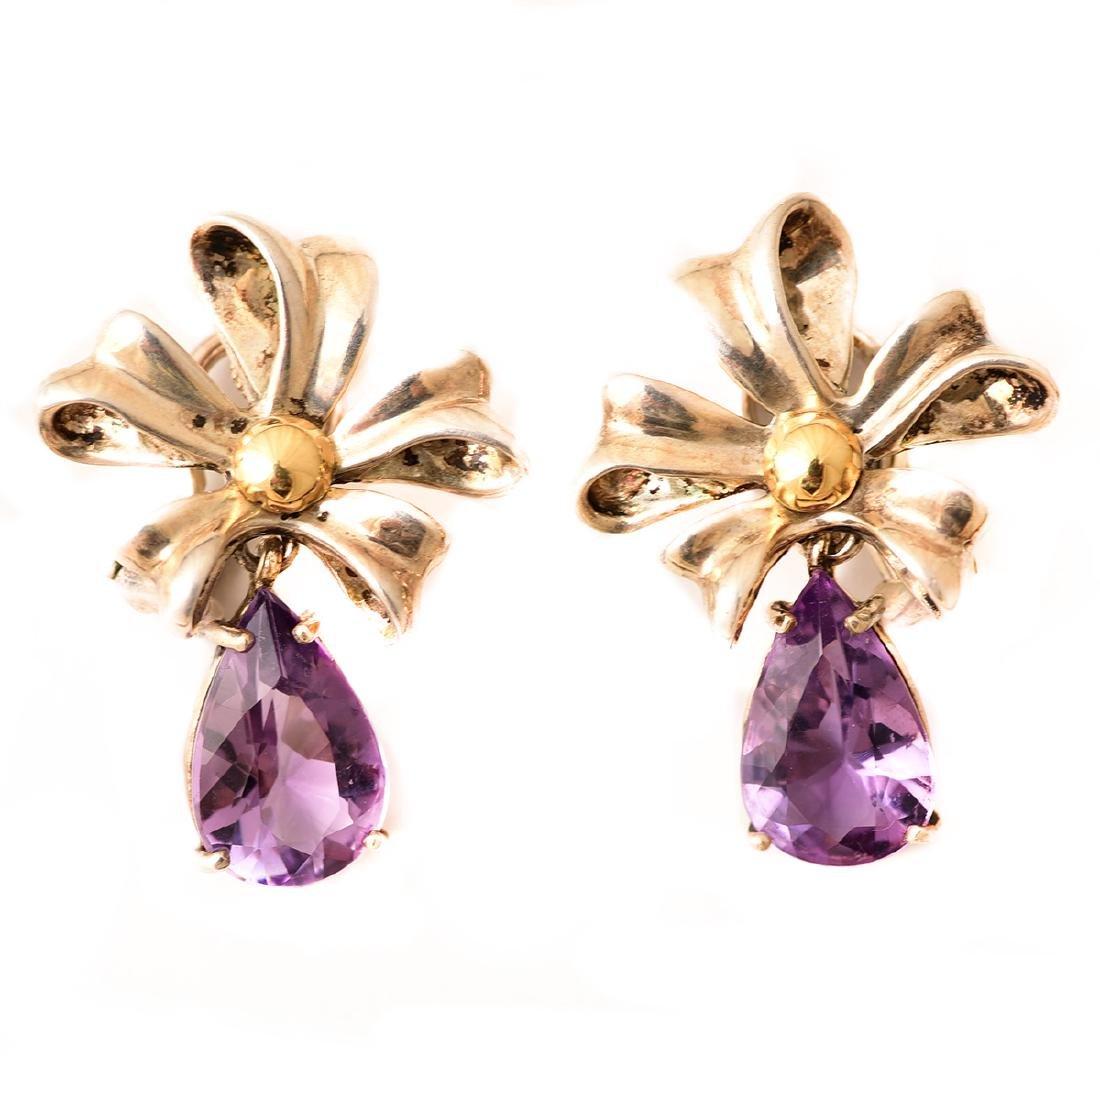 Pair of Tiffany & Co. Amethyst, Sterling Silver, 18k